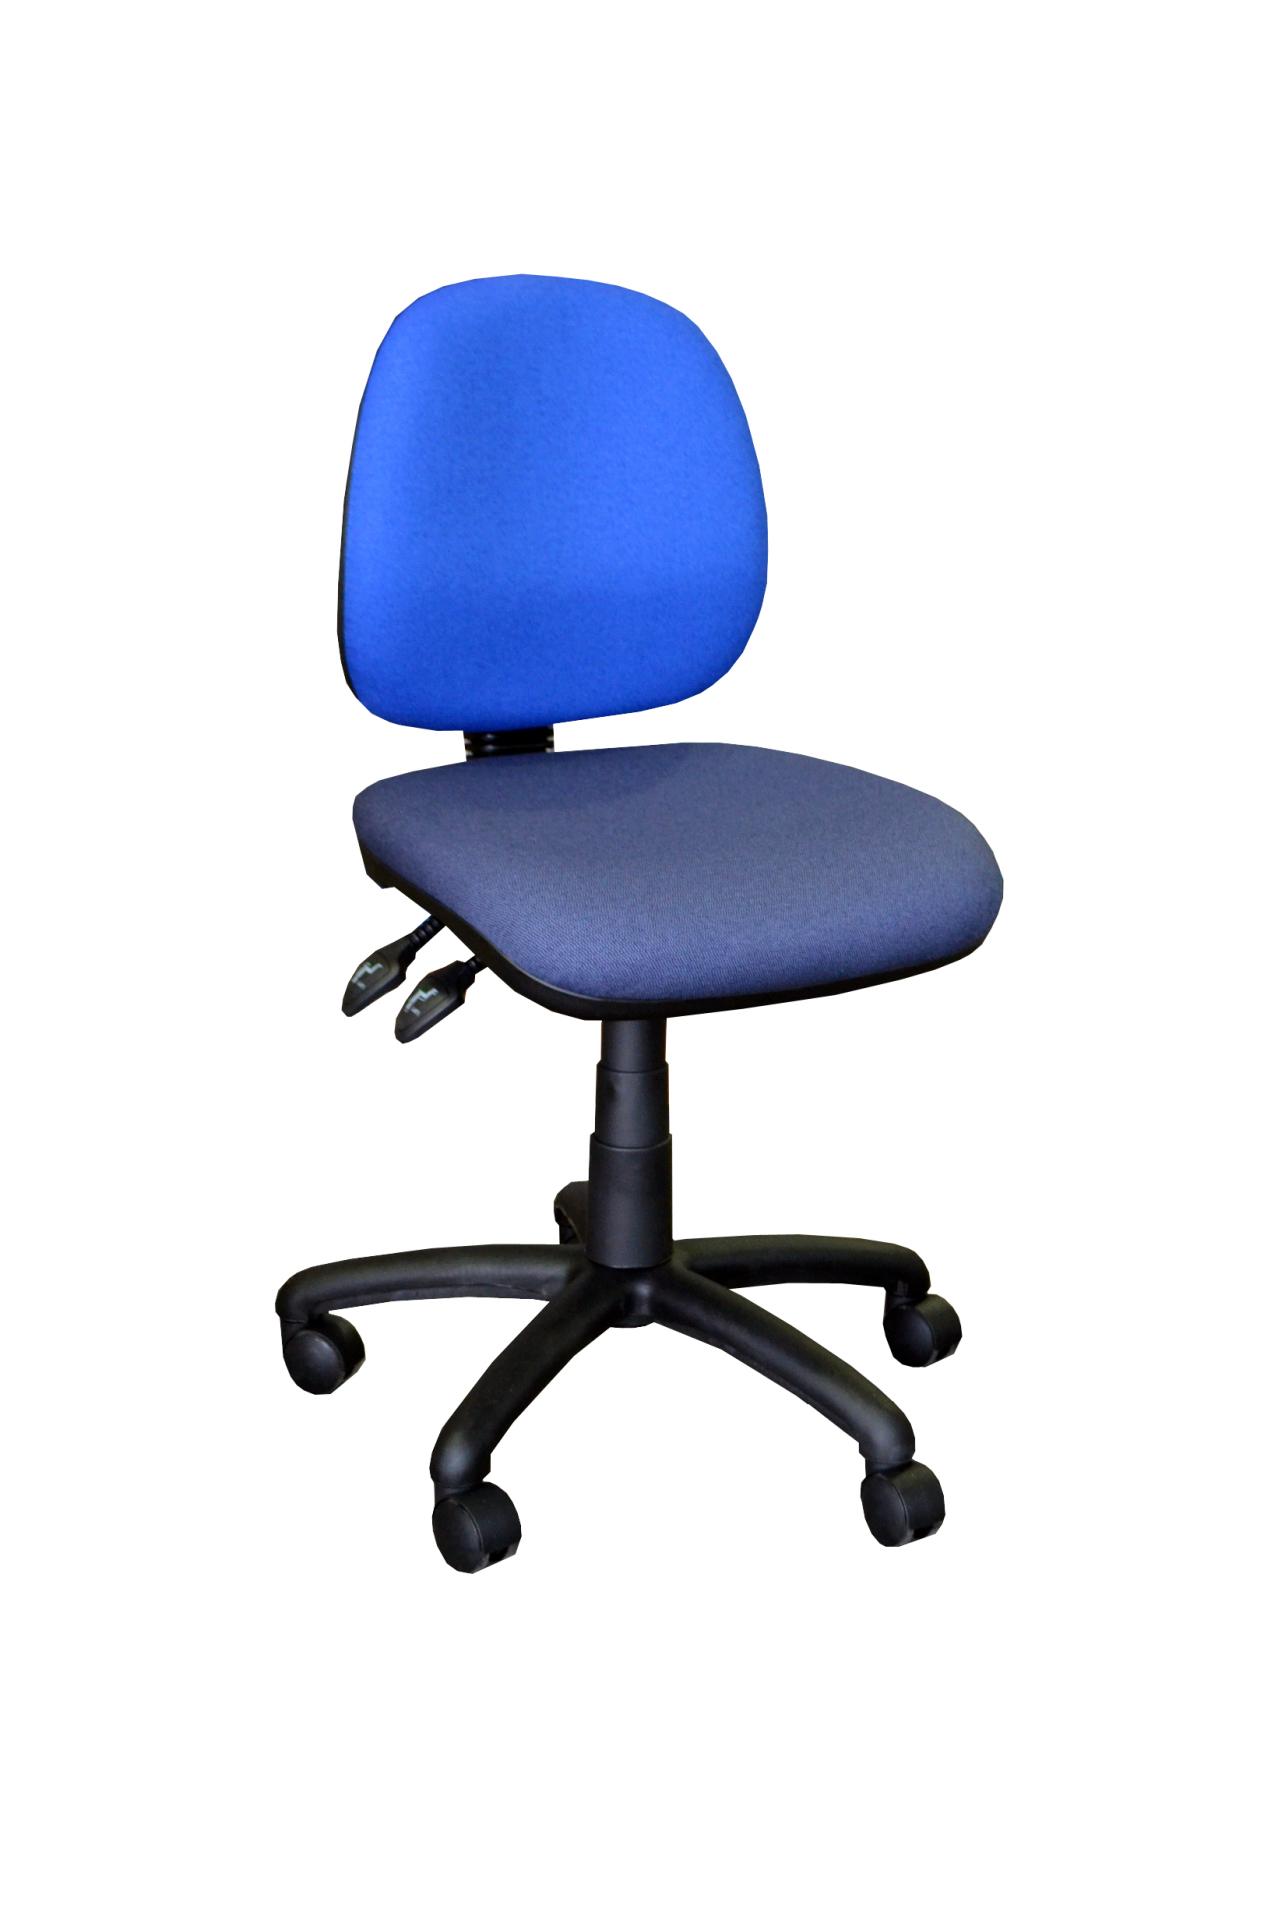 Direct Ergonomics | Sydney Office Furniture | Ergonomic Furniture | Ergonomic Seating | Executive and Task Seating | Executive Chair | Genex 600